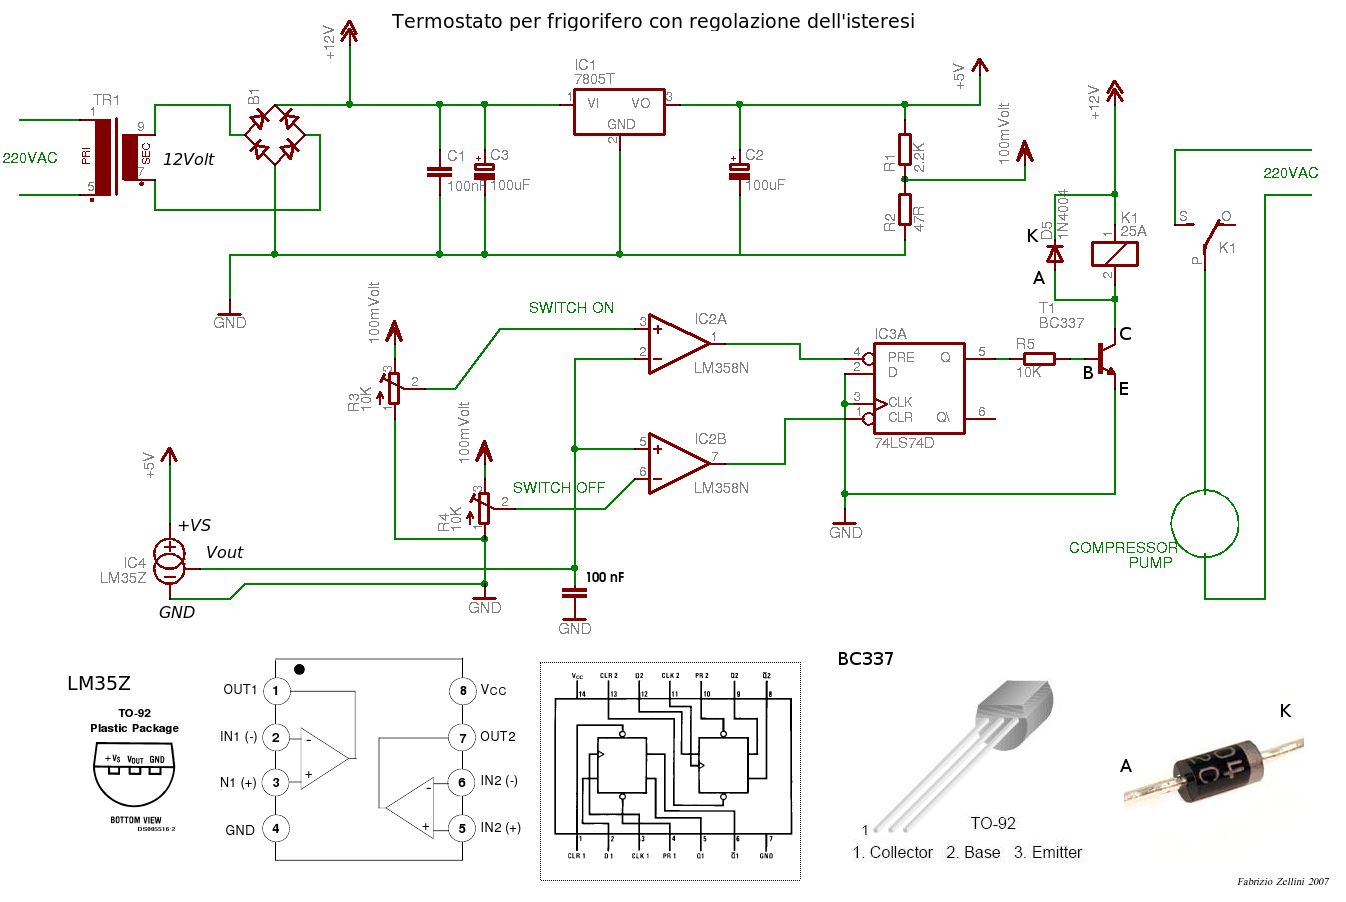 Schema elettrico frigorifero indesit for Frigo no frost non raffredda